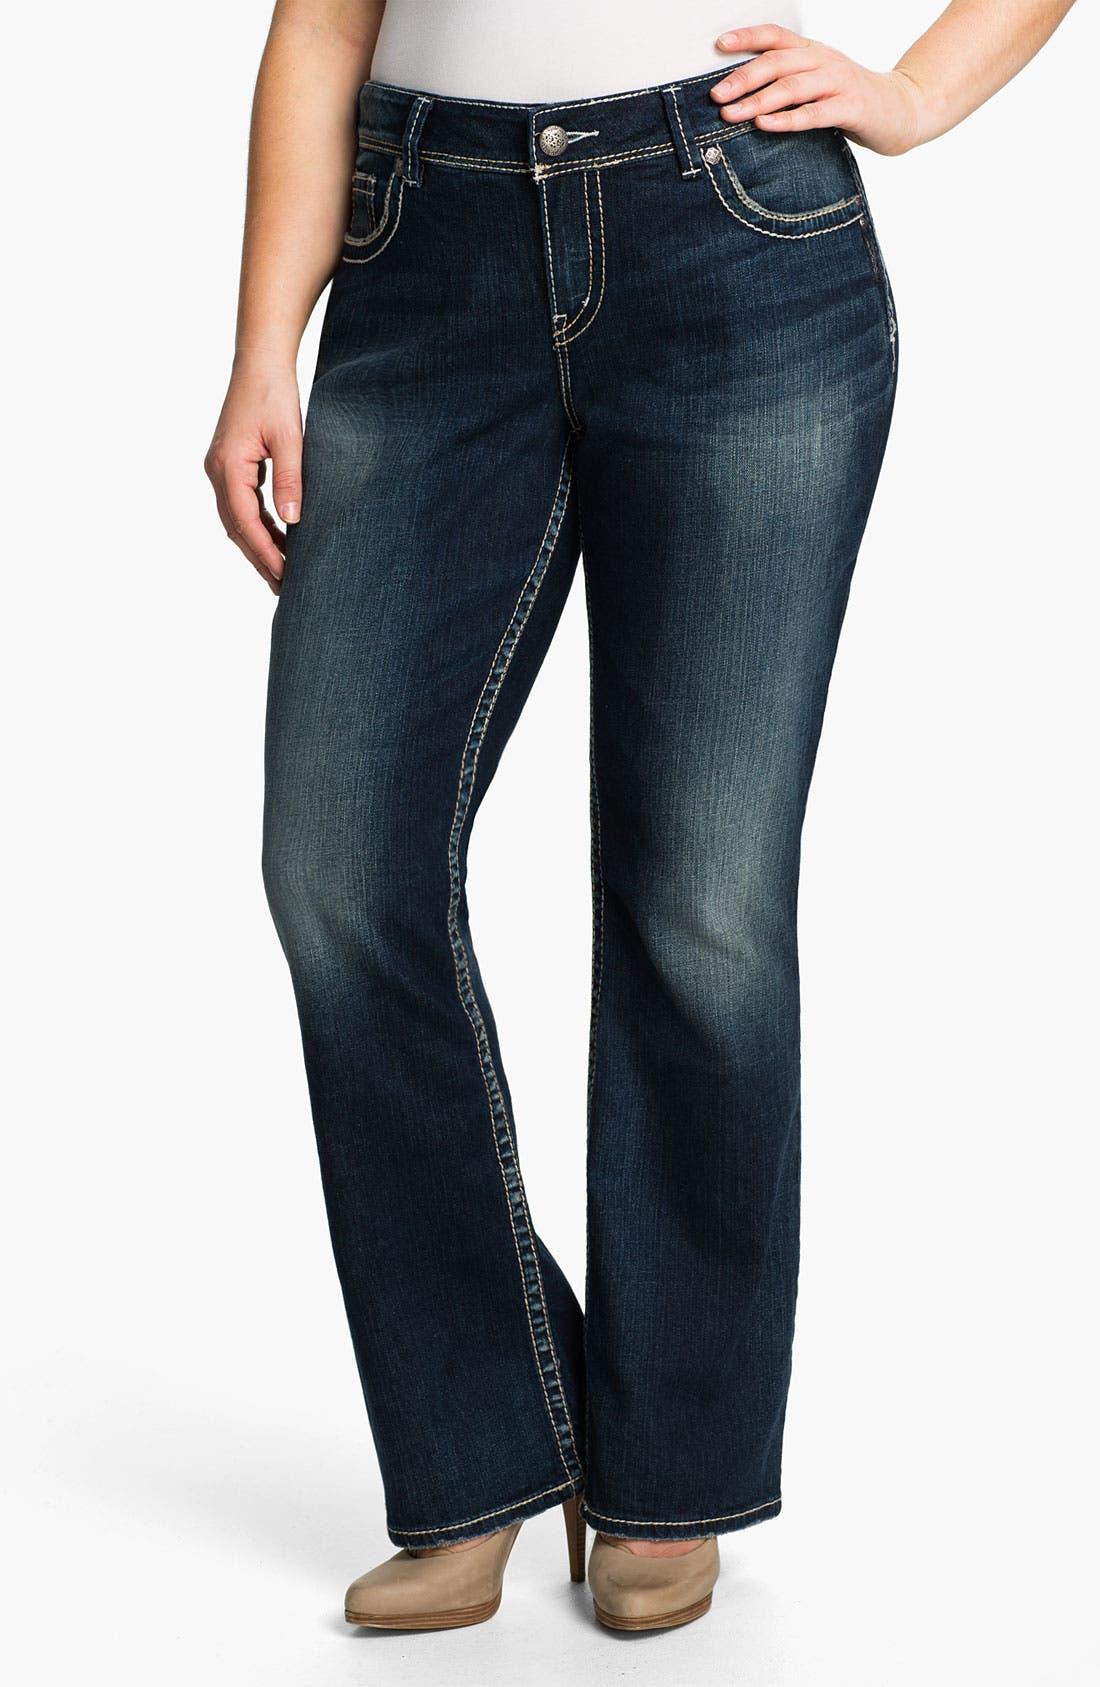 Main Image - Silver Jeans Co. 'Suki' Bootcut Jeans (Plus)